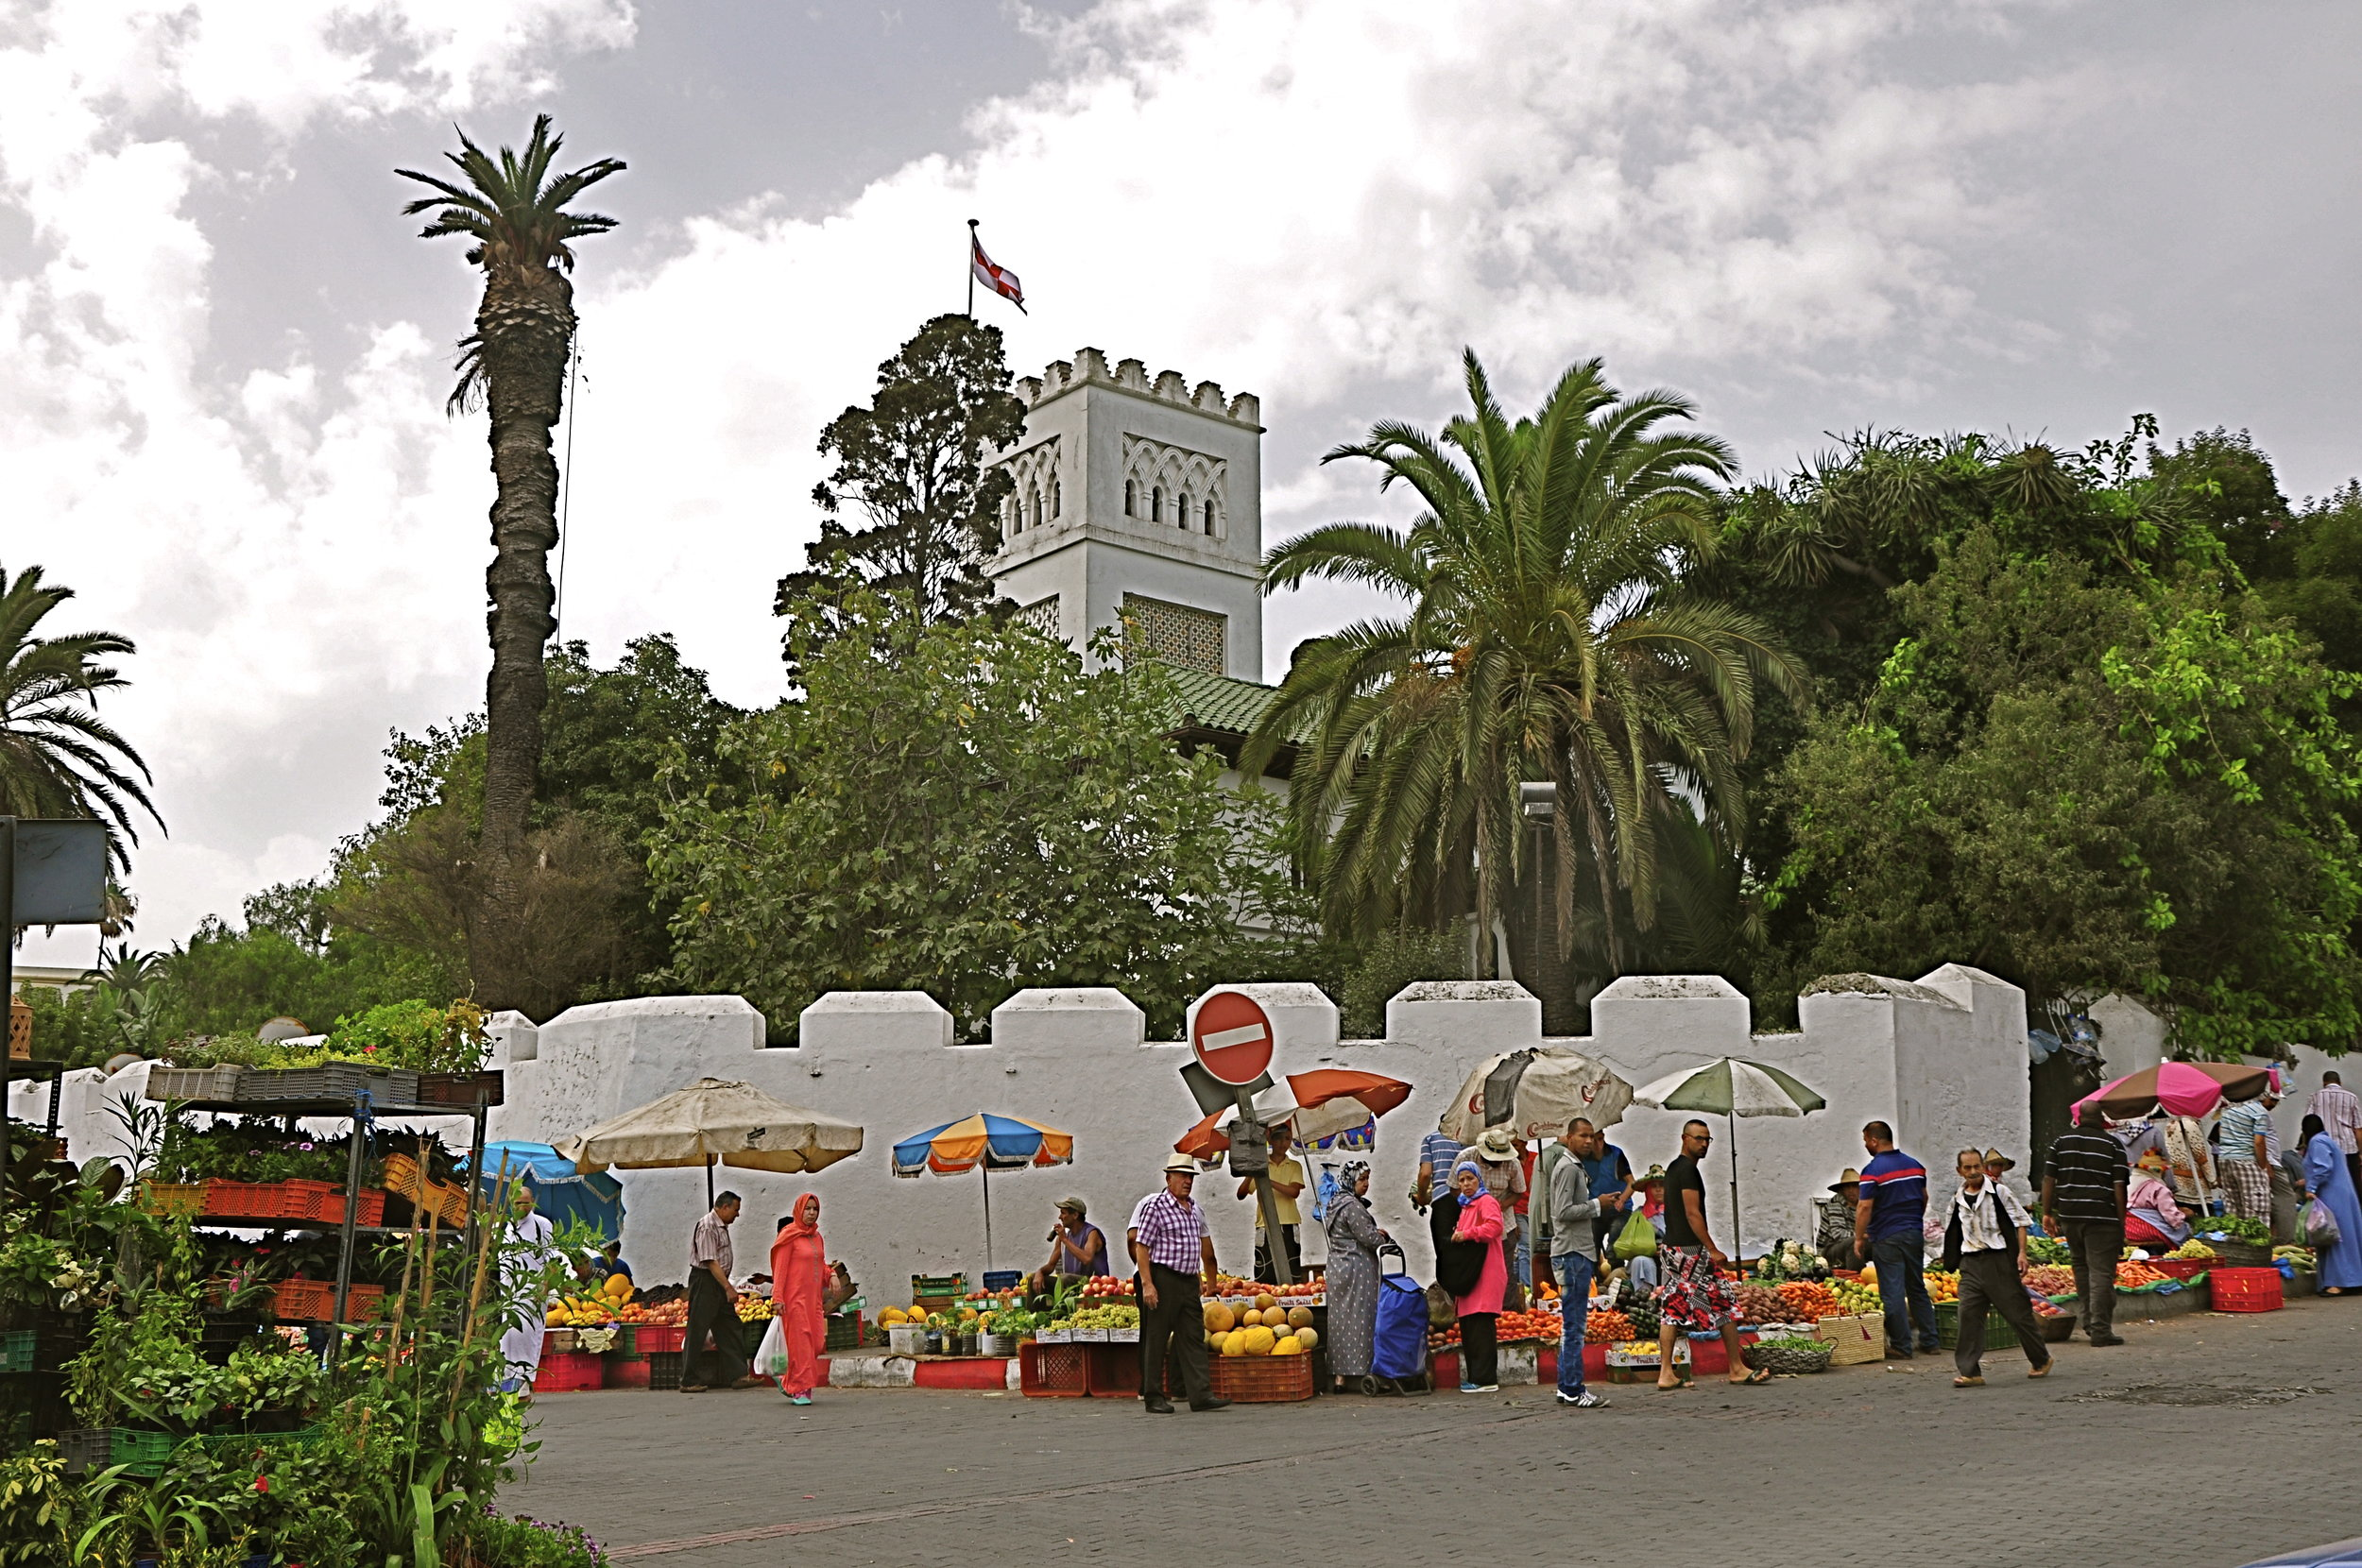 Berber market, English church